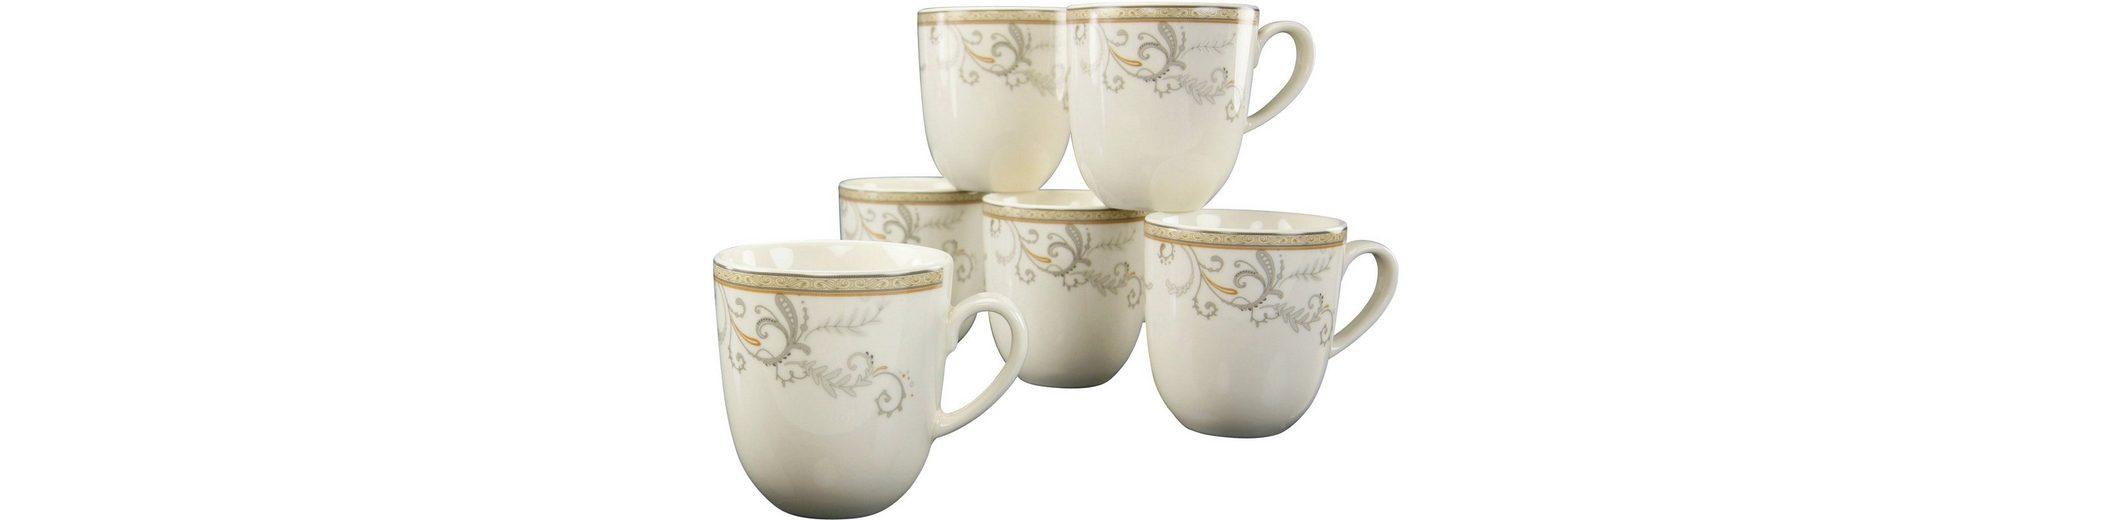 CreaTable 6 Kaffeebecher, Premium-Porzellan, »Villa Medici«